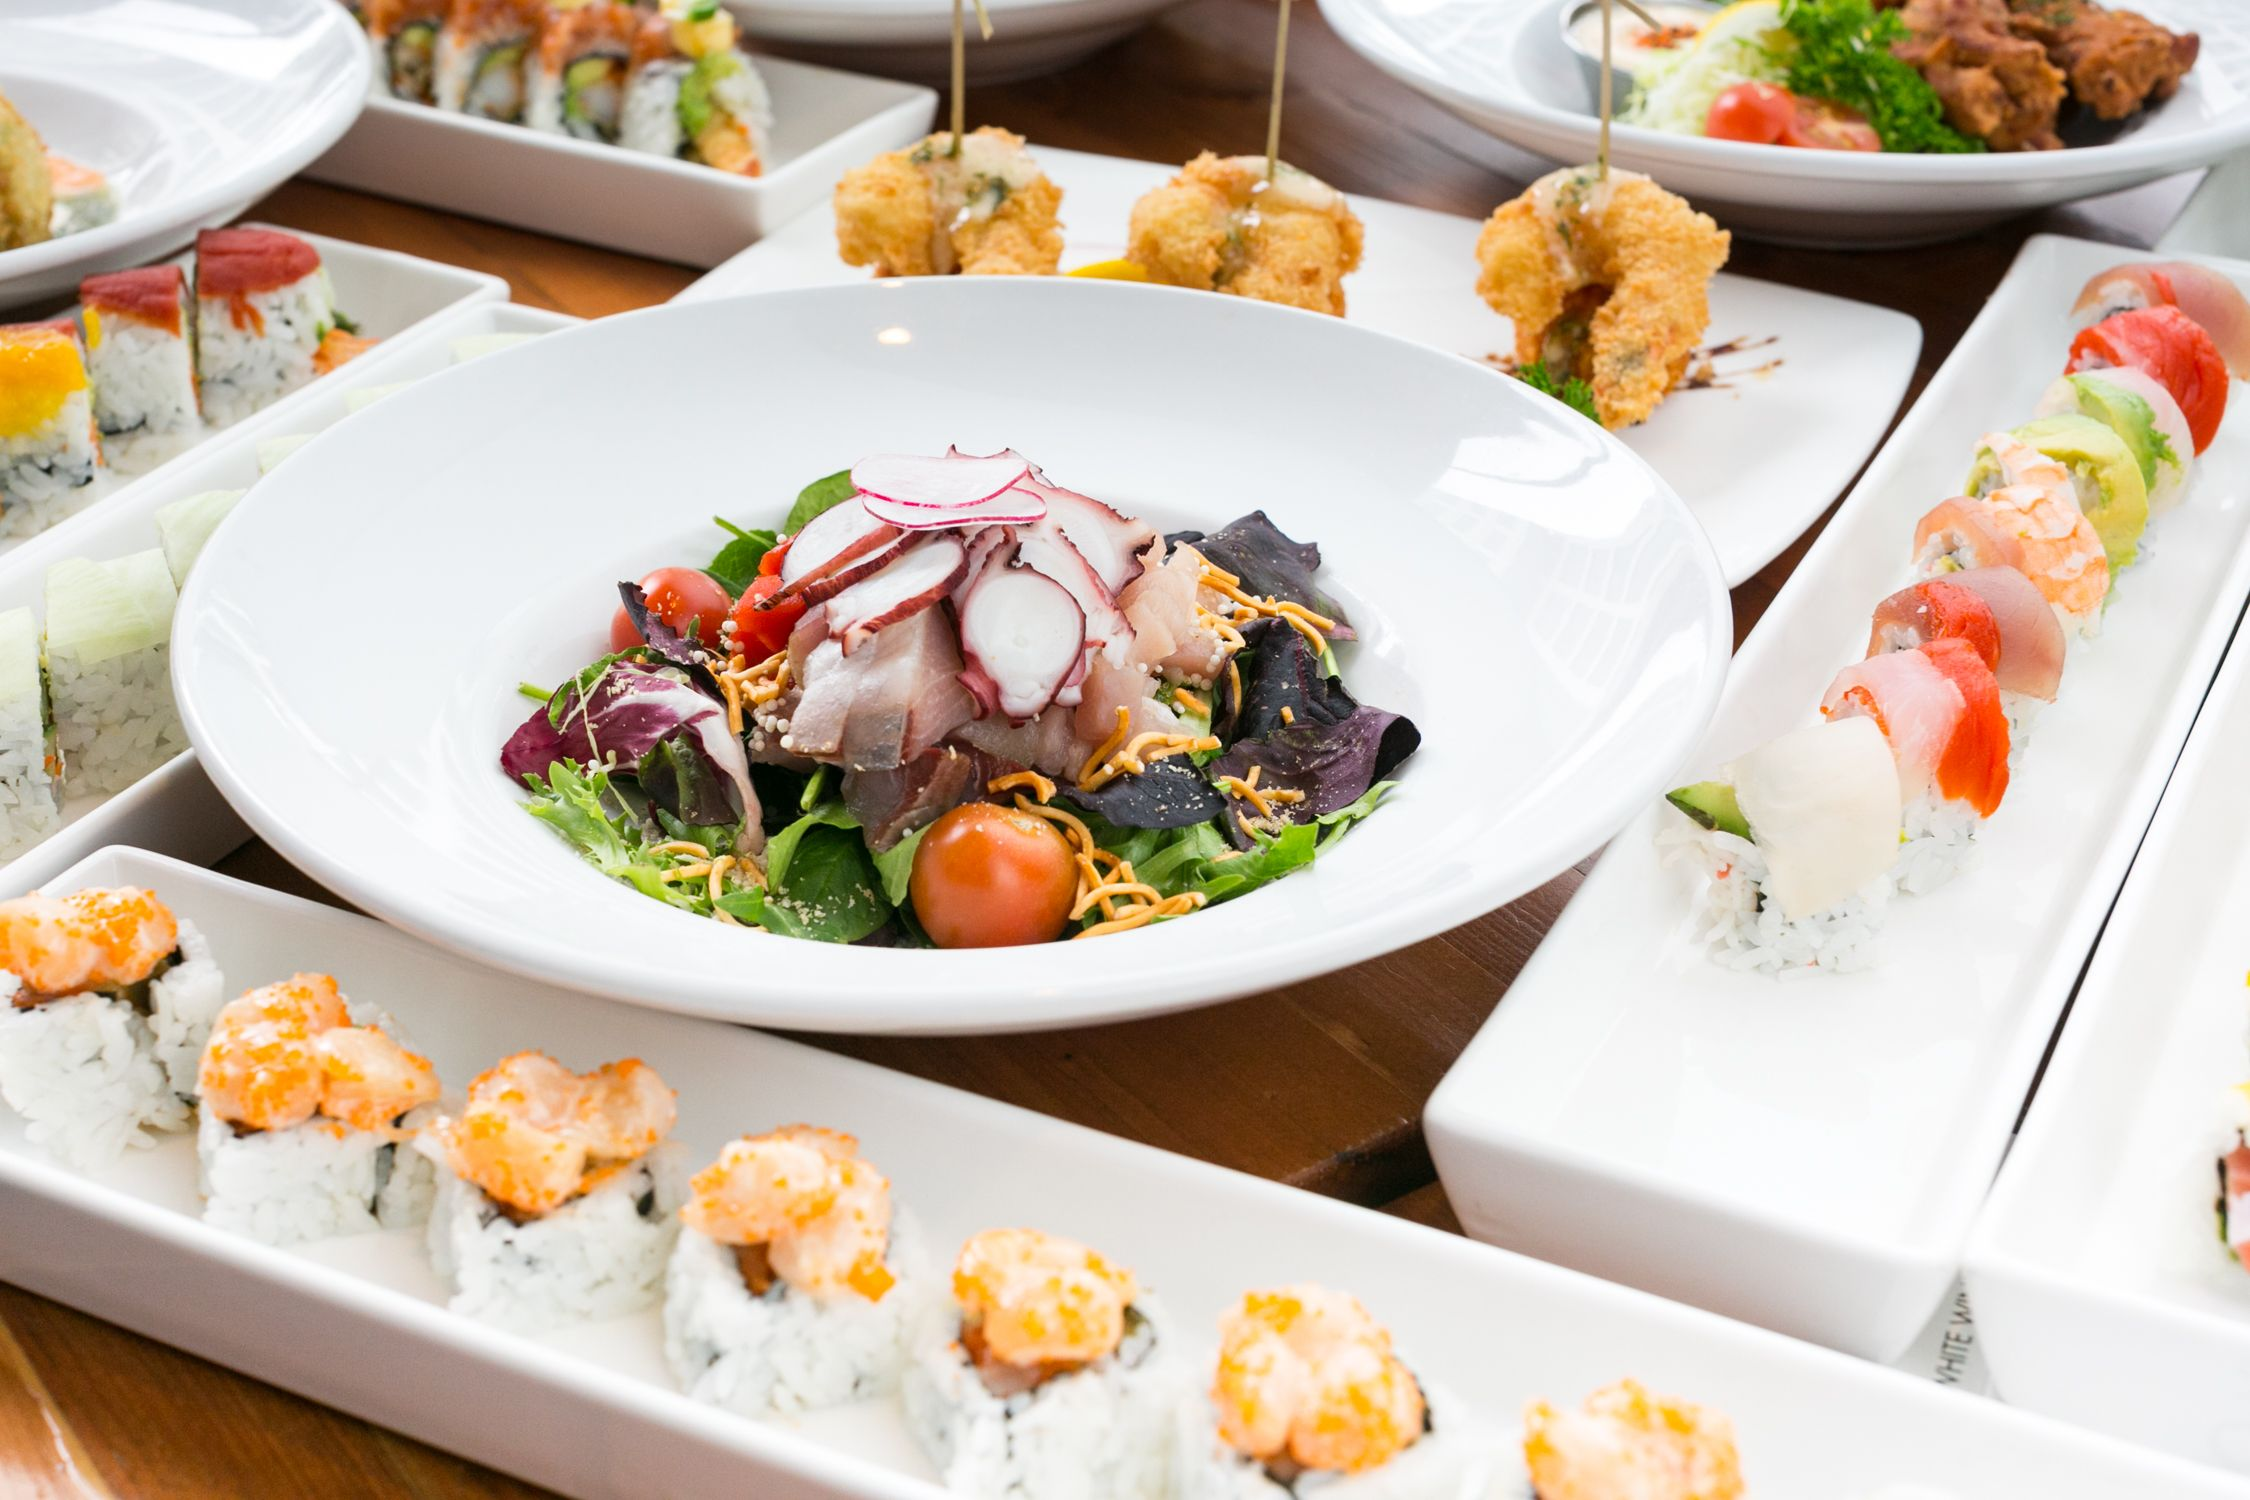 📸 : Marlboro Wang Photography  #bookfocal #nubo #foodphotographer #foodphotography #foodphotoshoot #foodpics #sushi #foodinspo #victoriabcphotographer